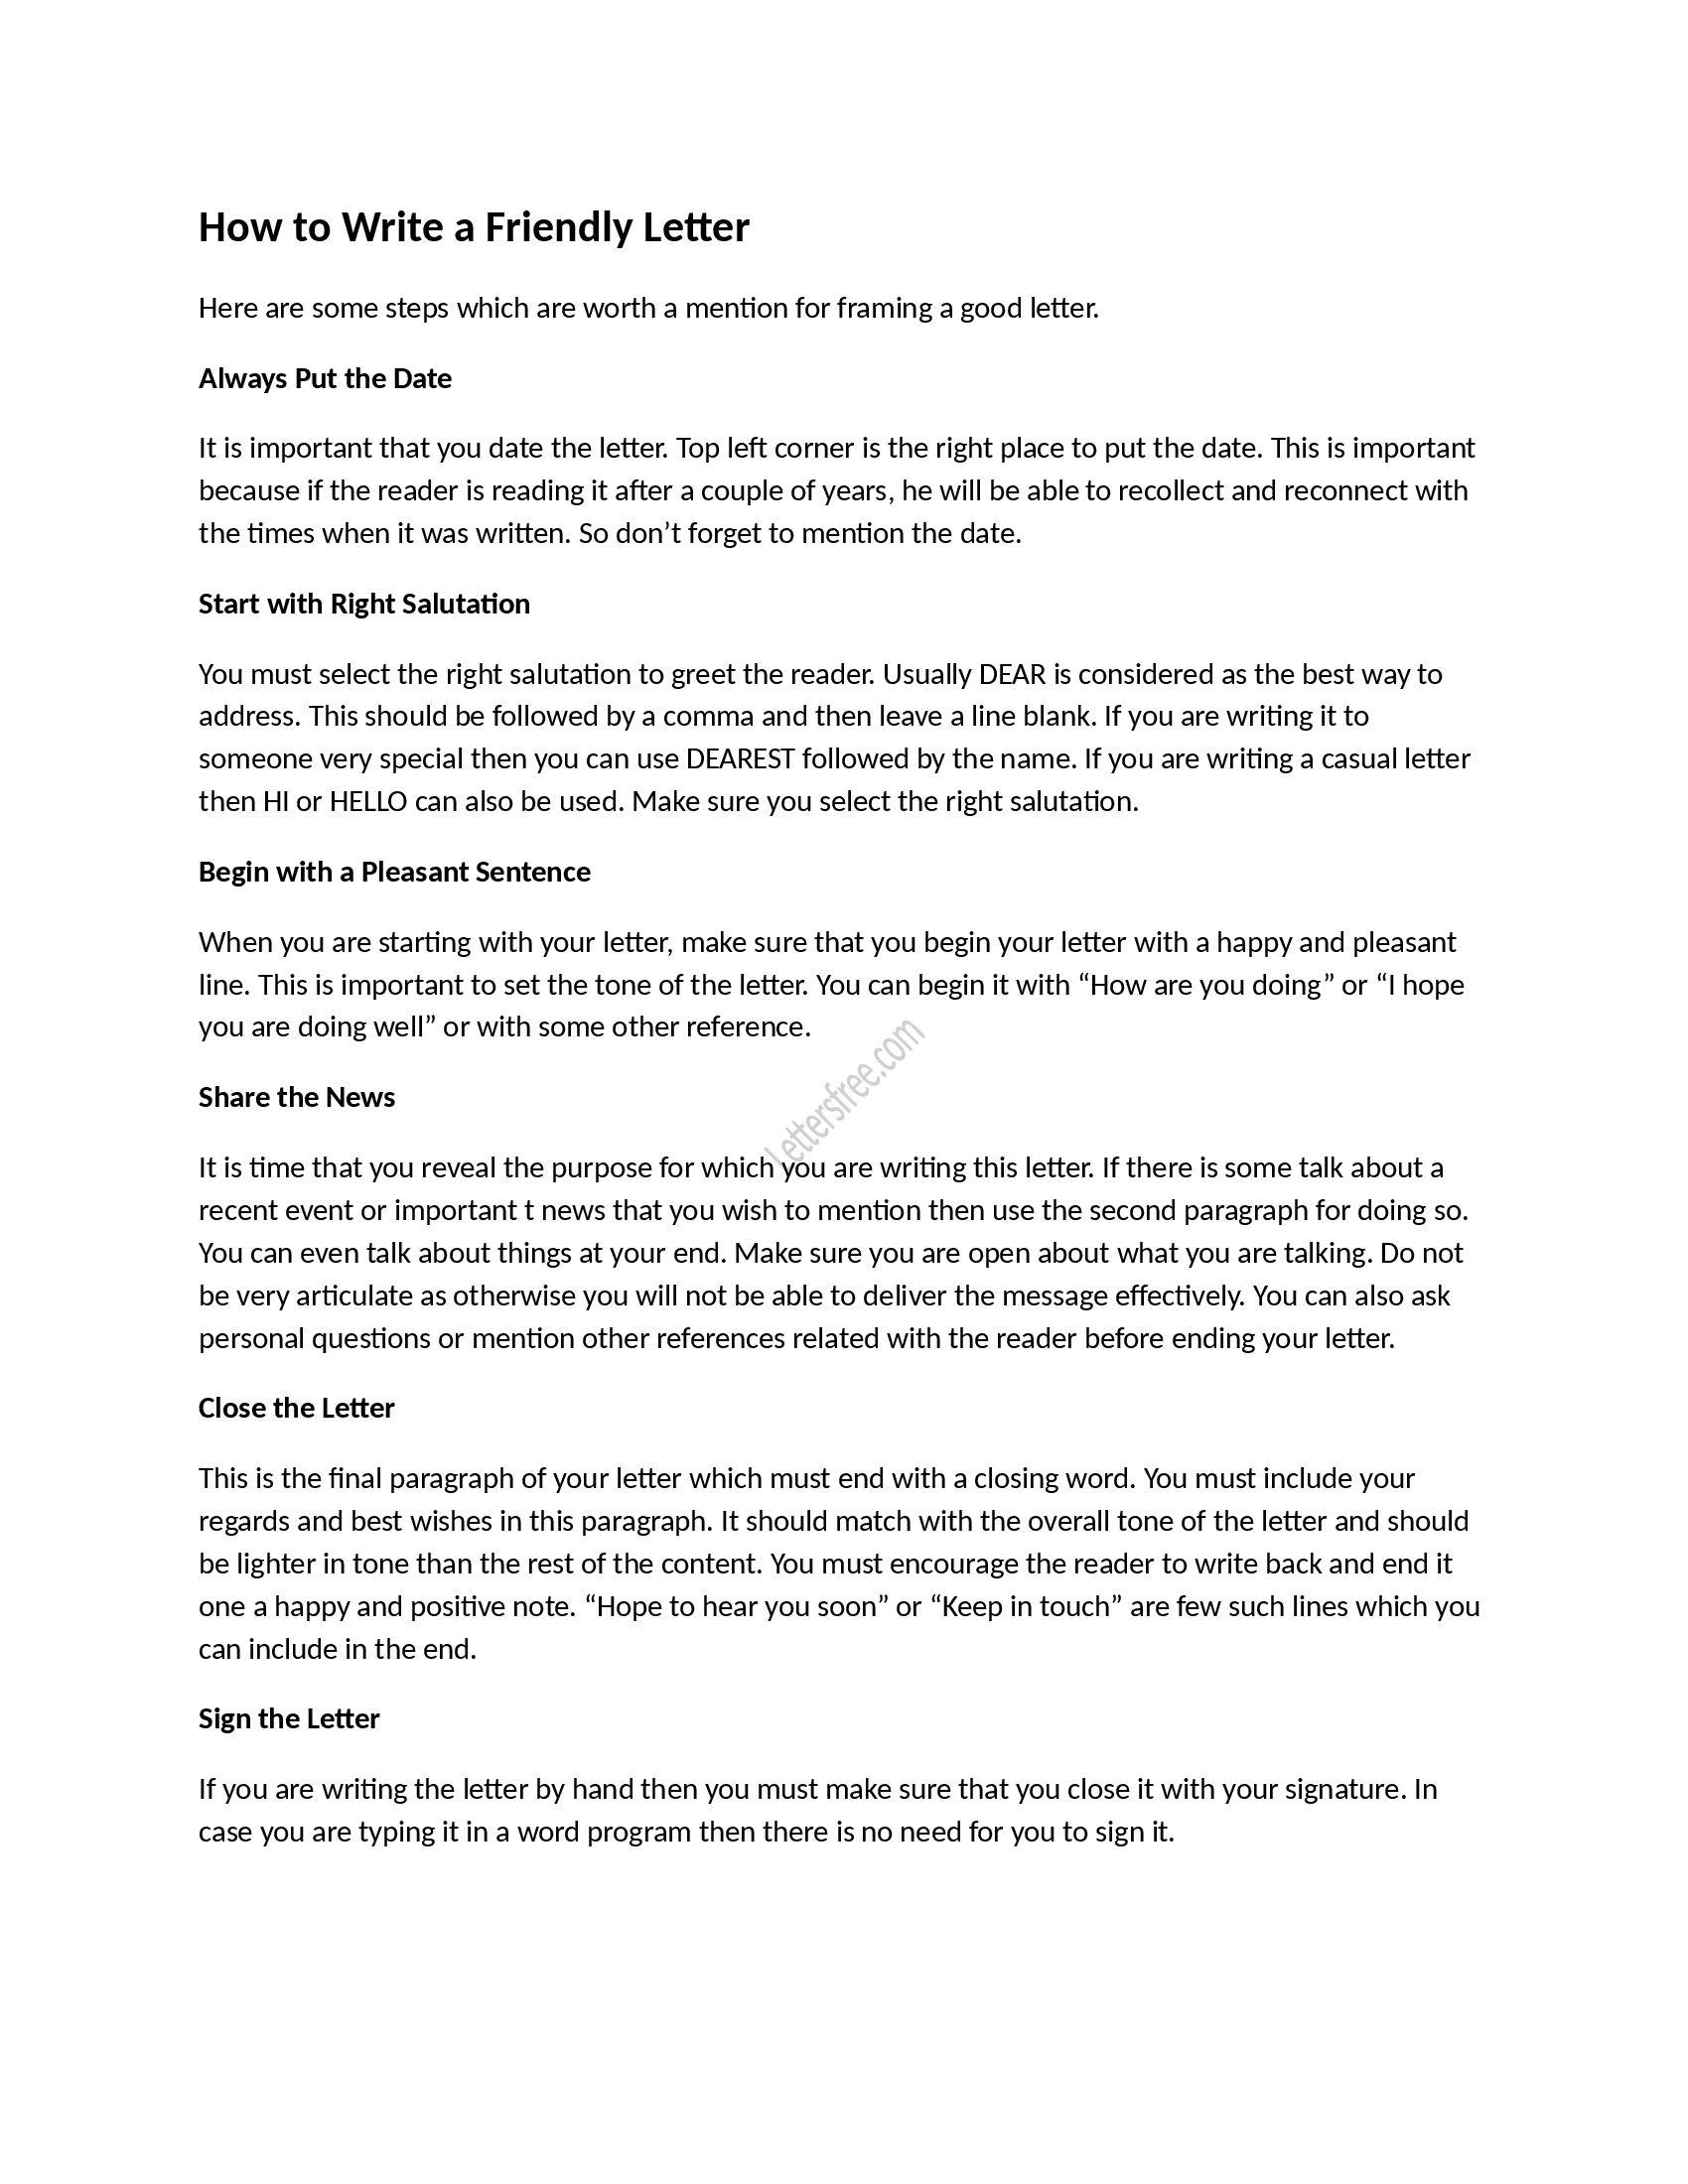 Friendly Letter Format Worksheet